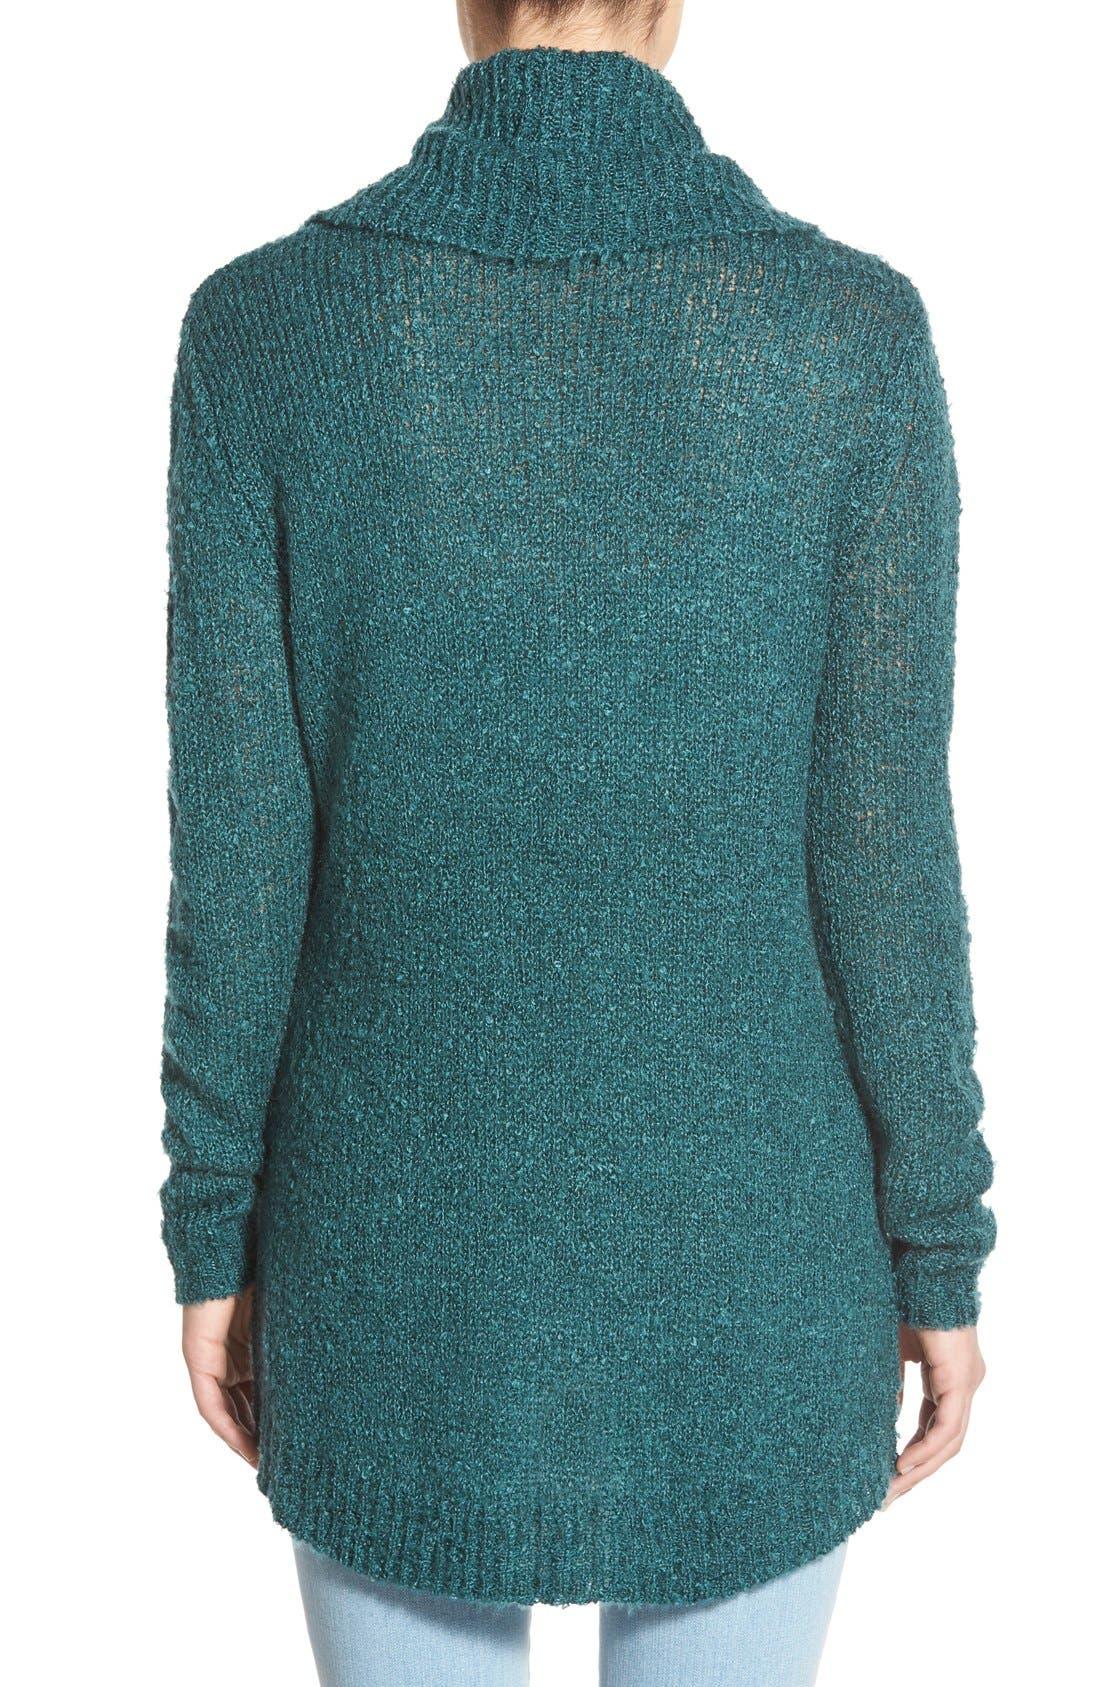 Alternate Image 2  - BP. Cowl Neck Tunic Sweater